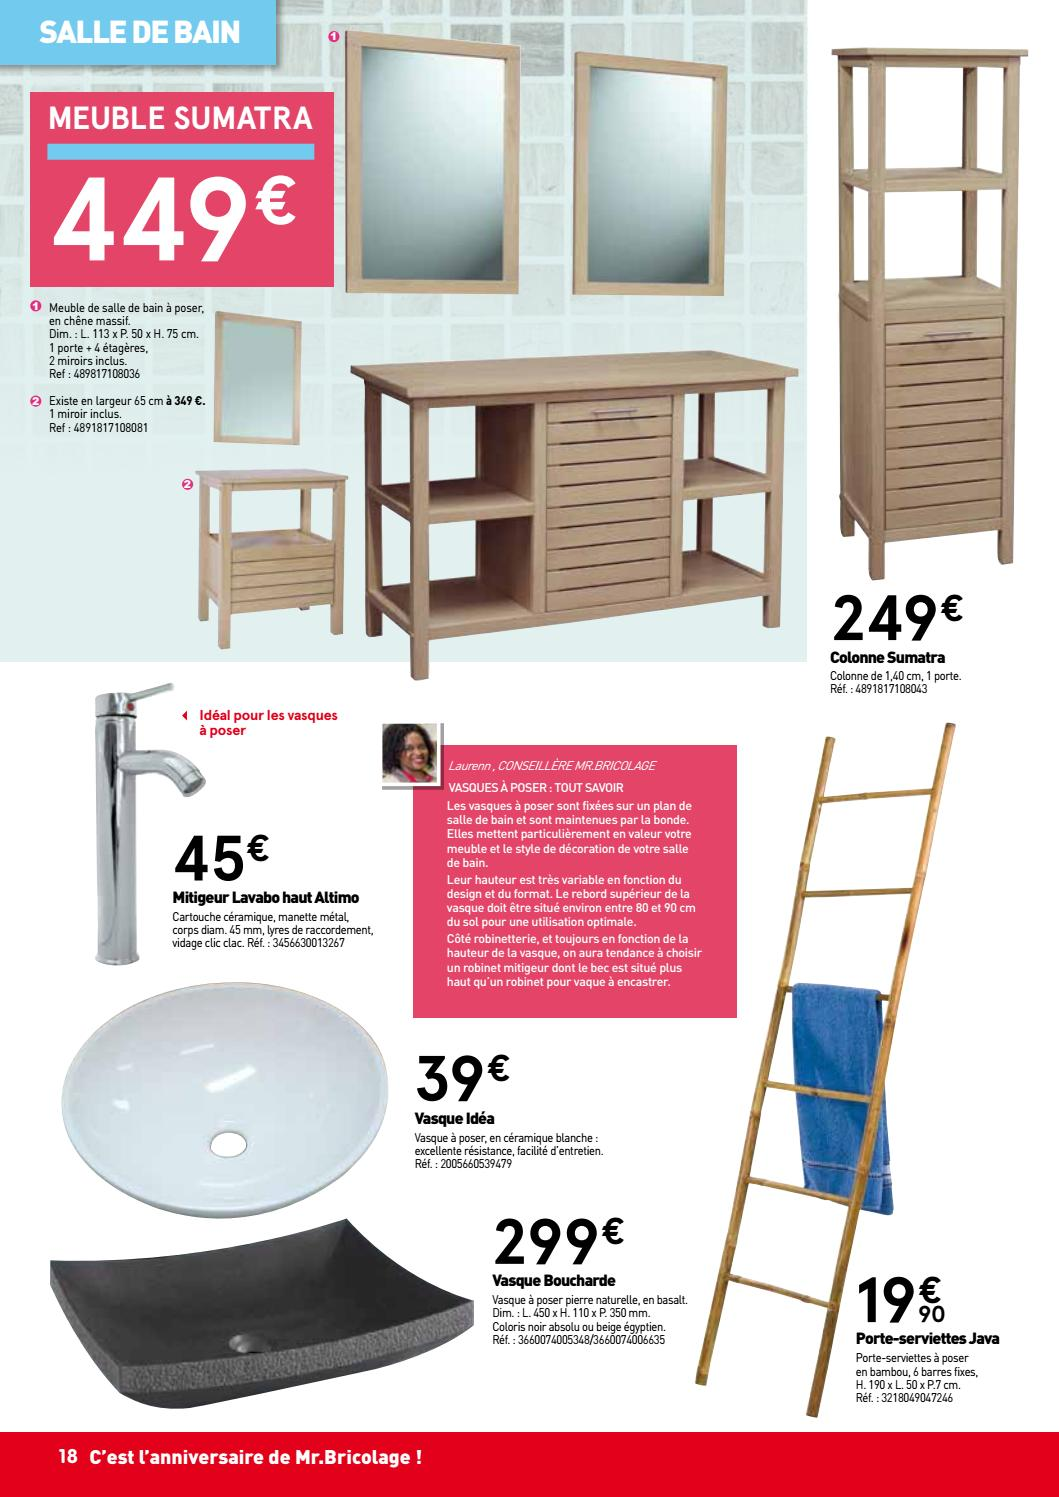 mr bricolage robinet mr bricolage mitigeur cuisine avec design idee de douche a l italienne. Black Bedroom Furniture Sets. Home Design Ideas